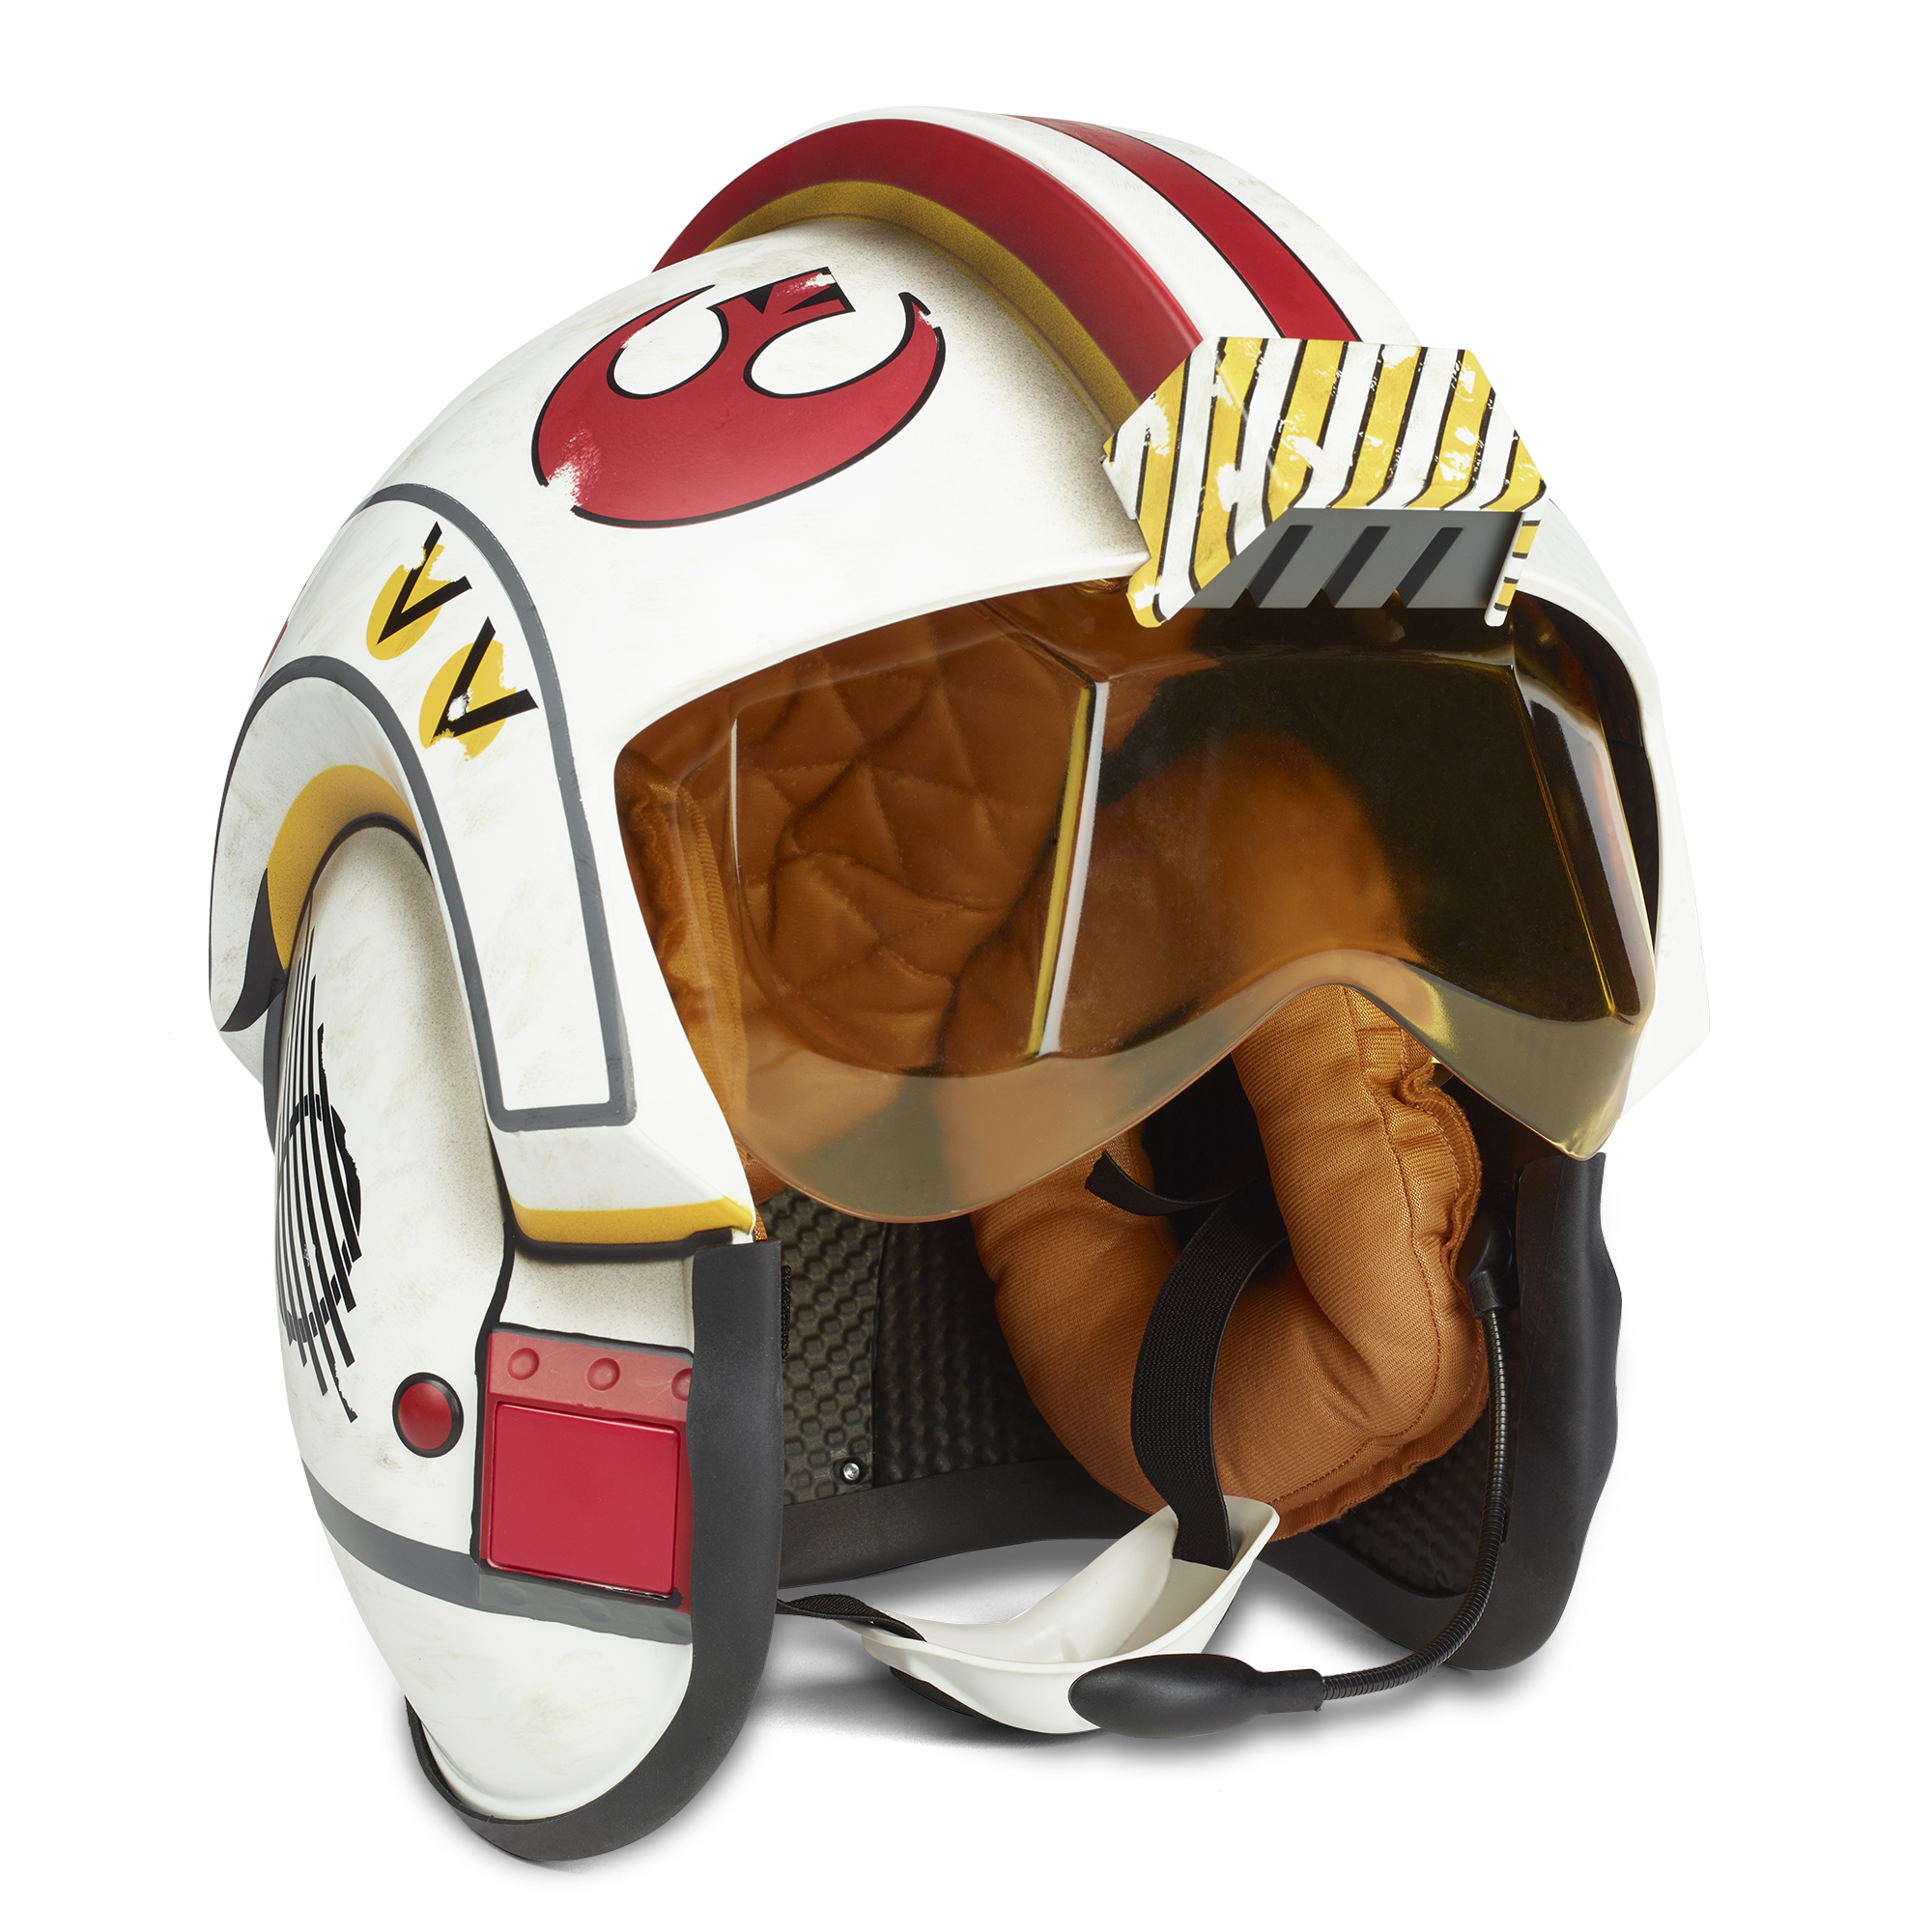 Star Wars The Black Series Luke Skywalker Battle Simulation Helmet by Hasbro Inc.